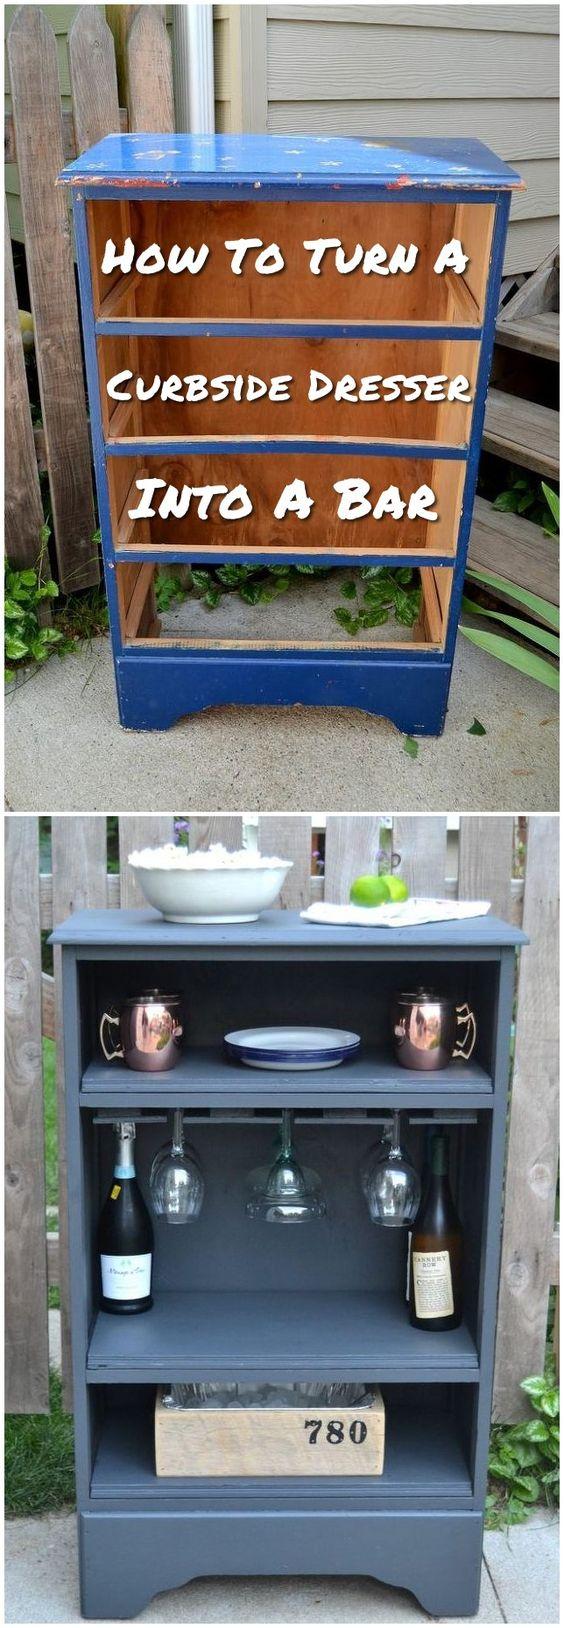 35 Cool Diy Home Decor Ideas